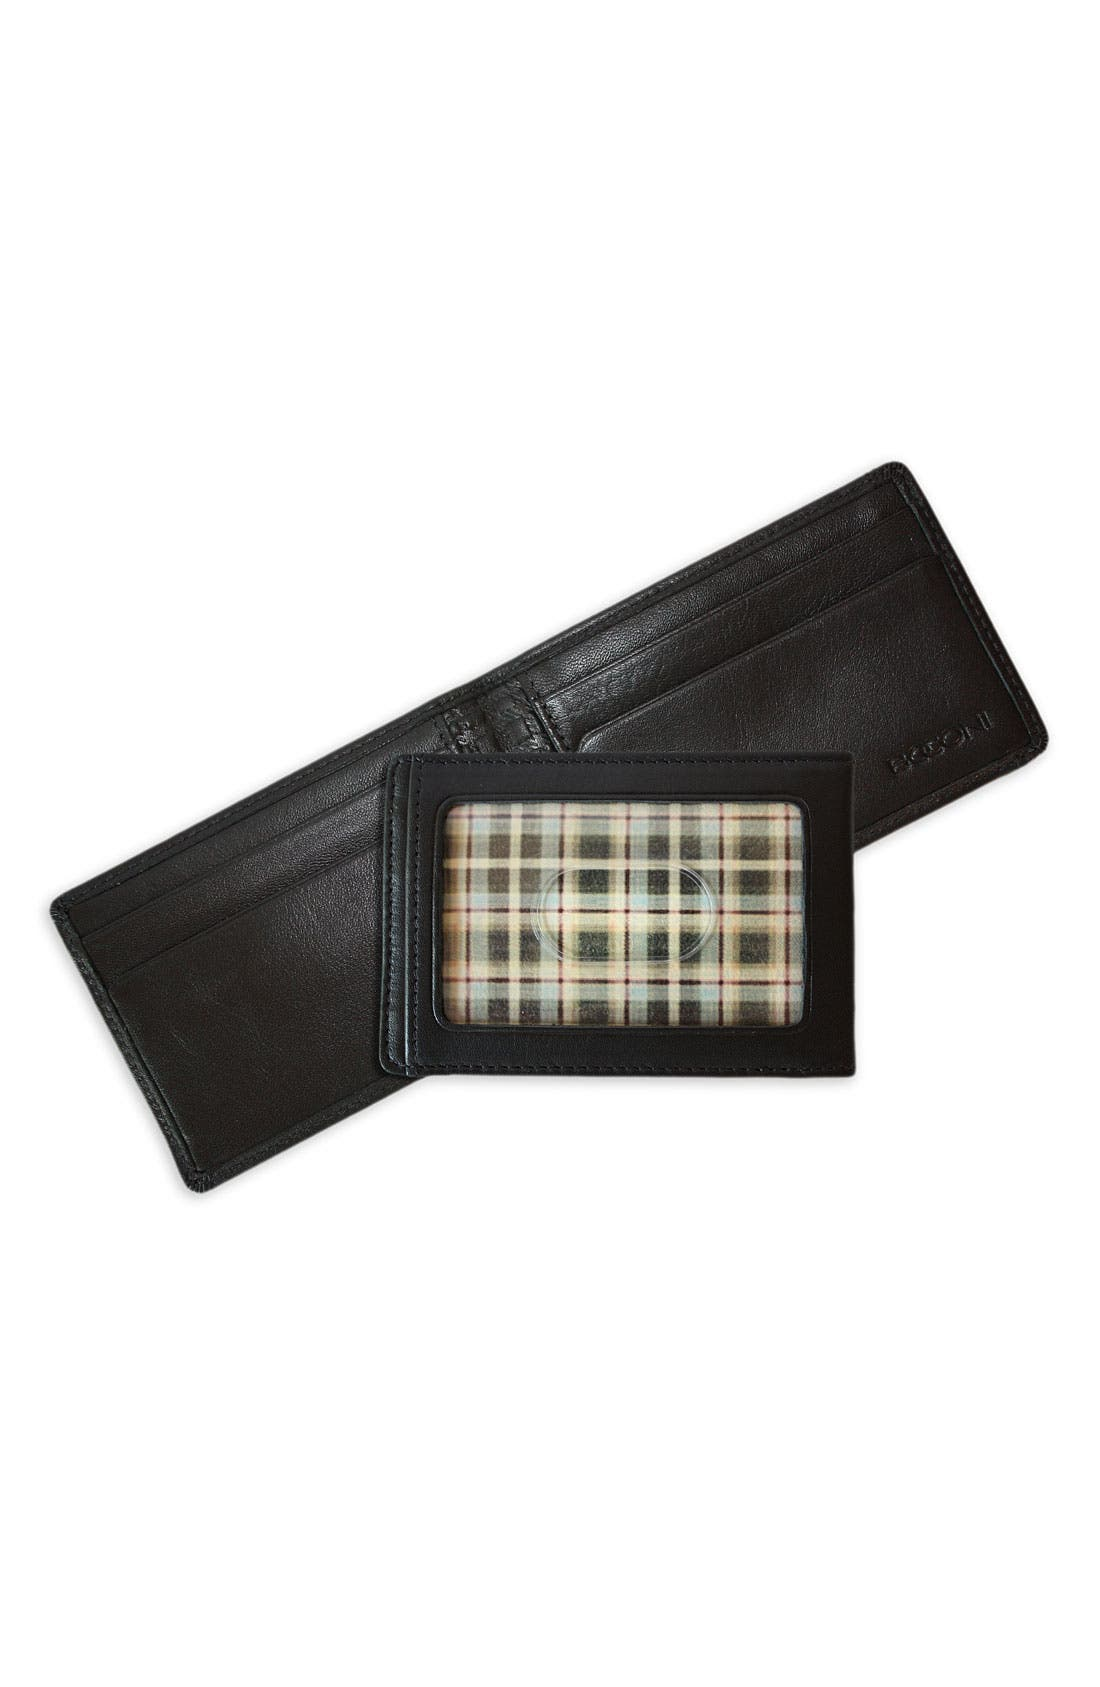 Main Image - Boconi Leather Money Clip Wallet